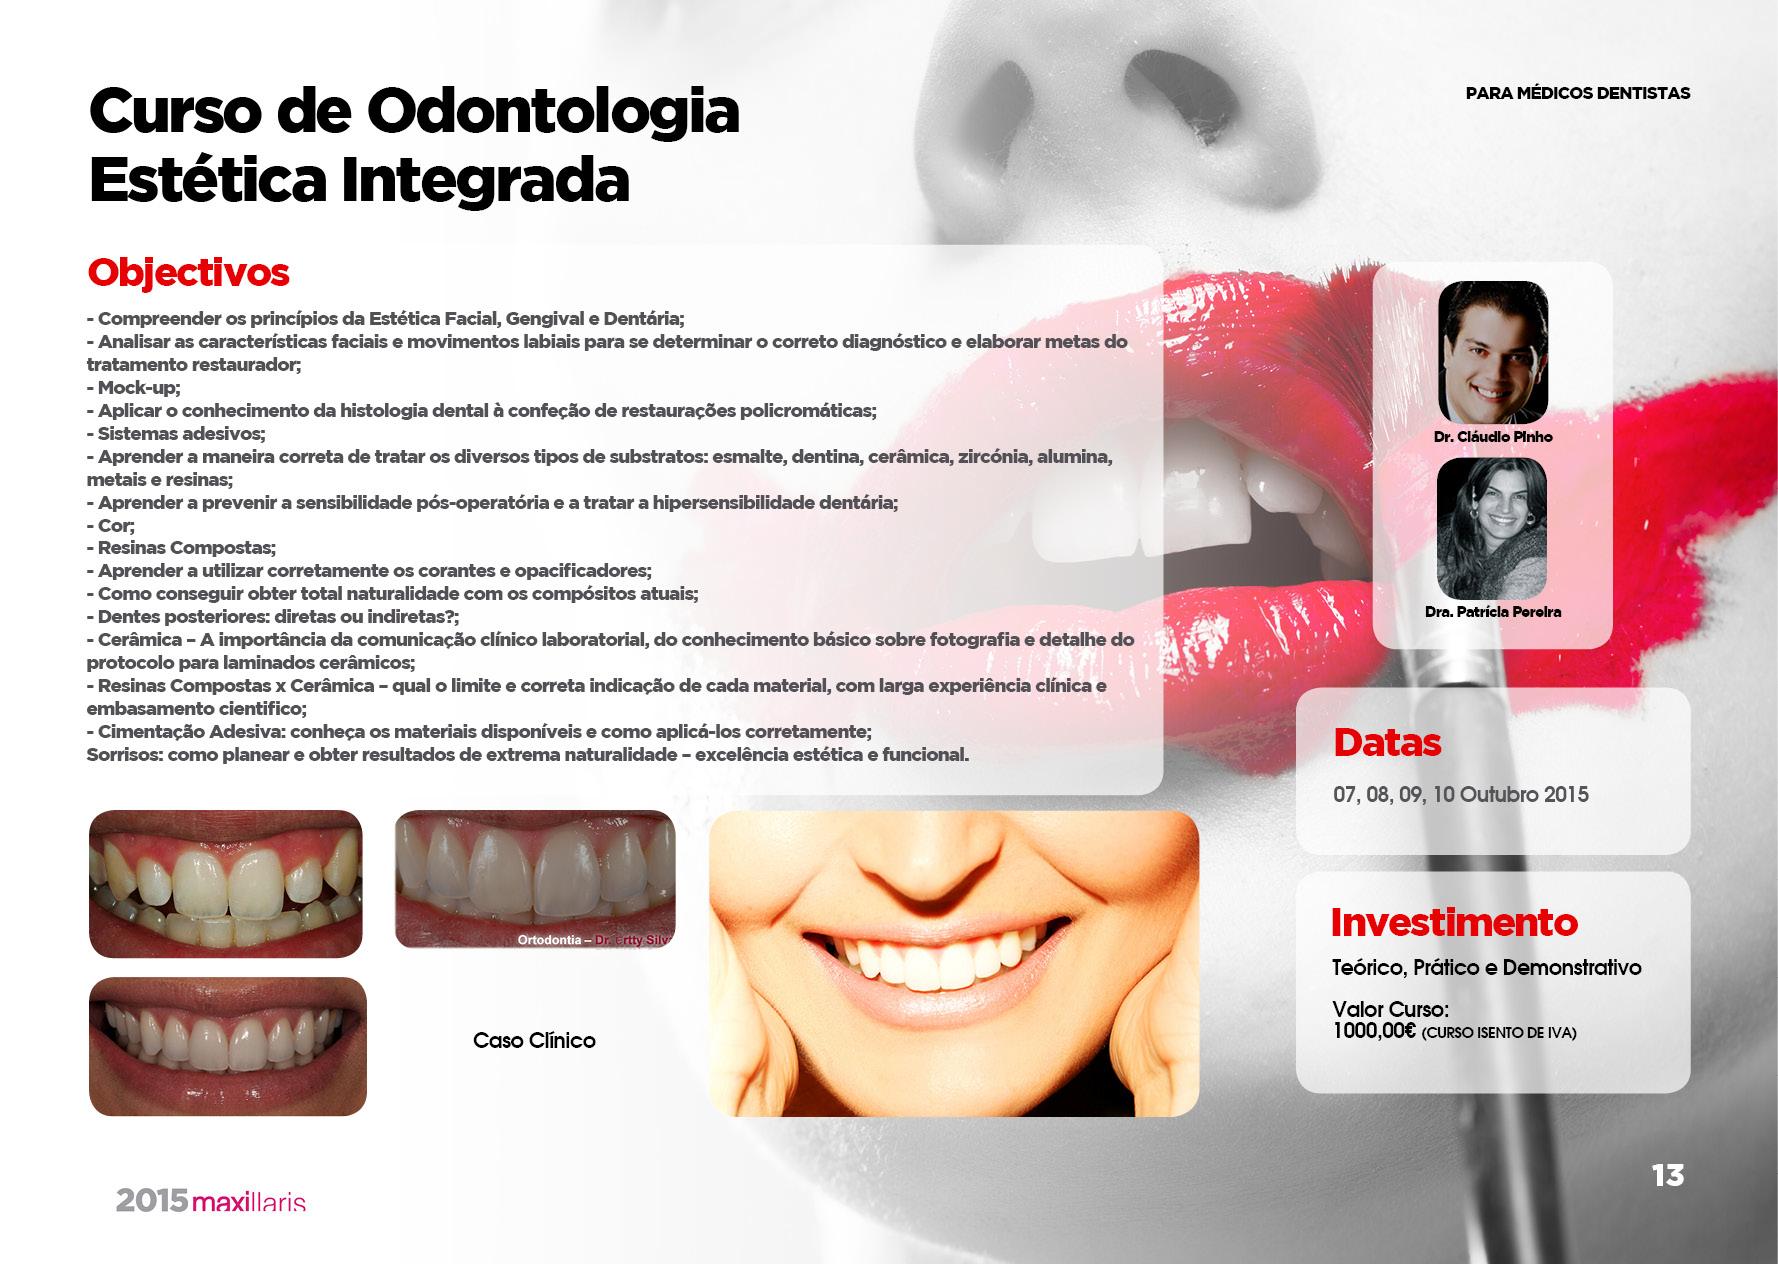 Curso de Odontologia Estética Integrada - Maxillaris